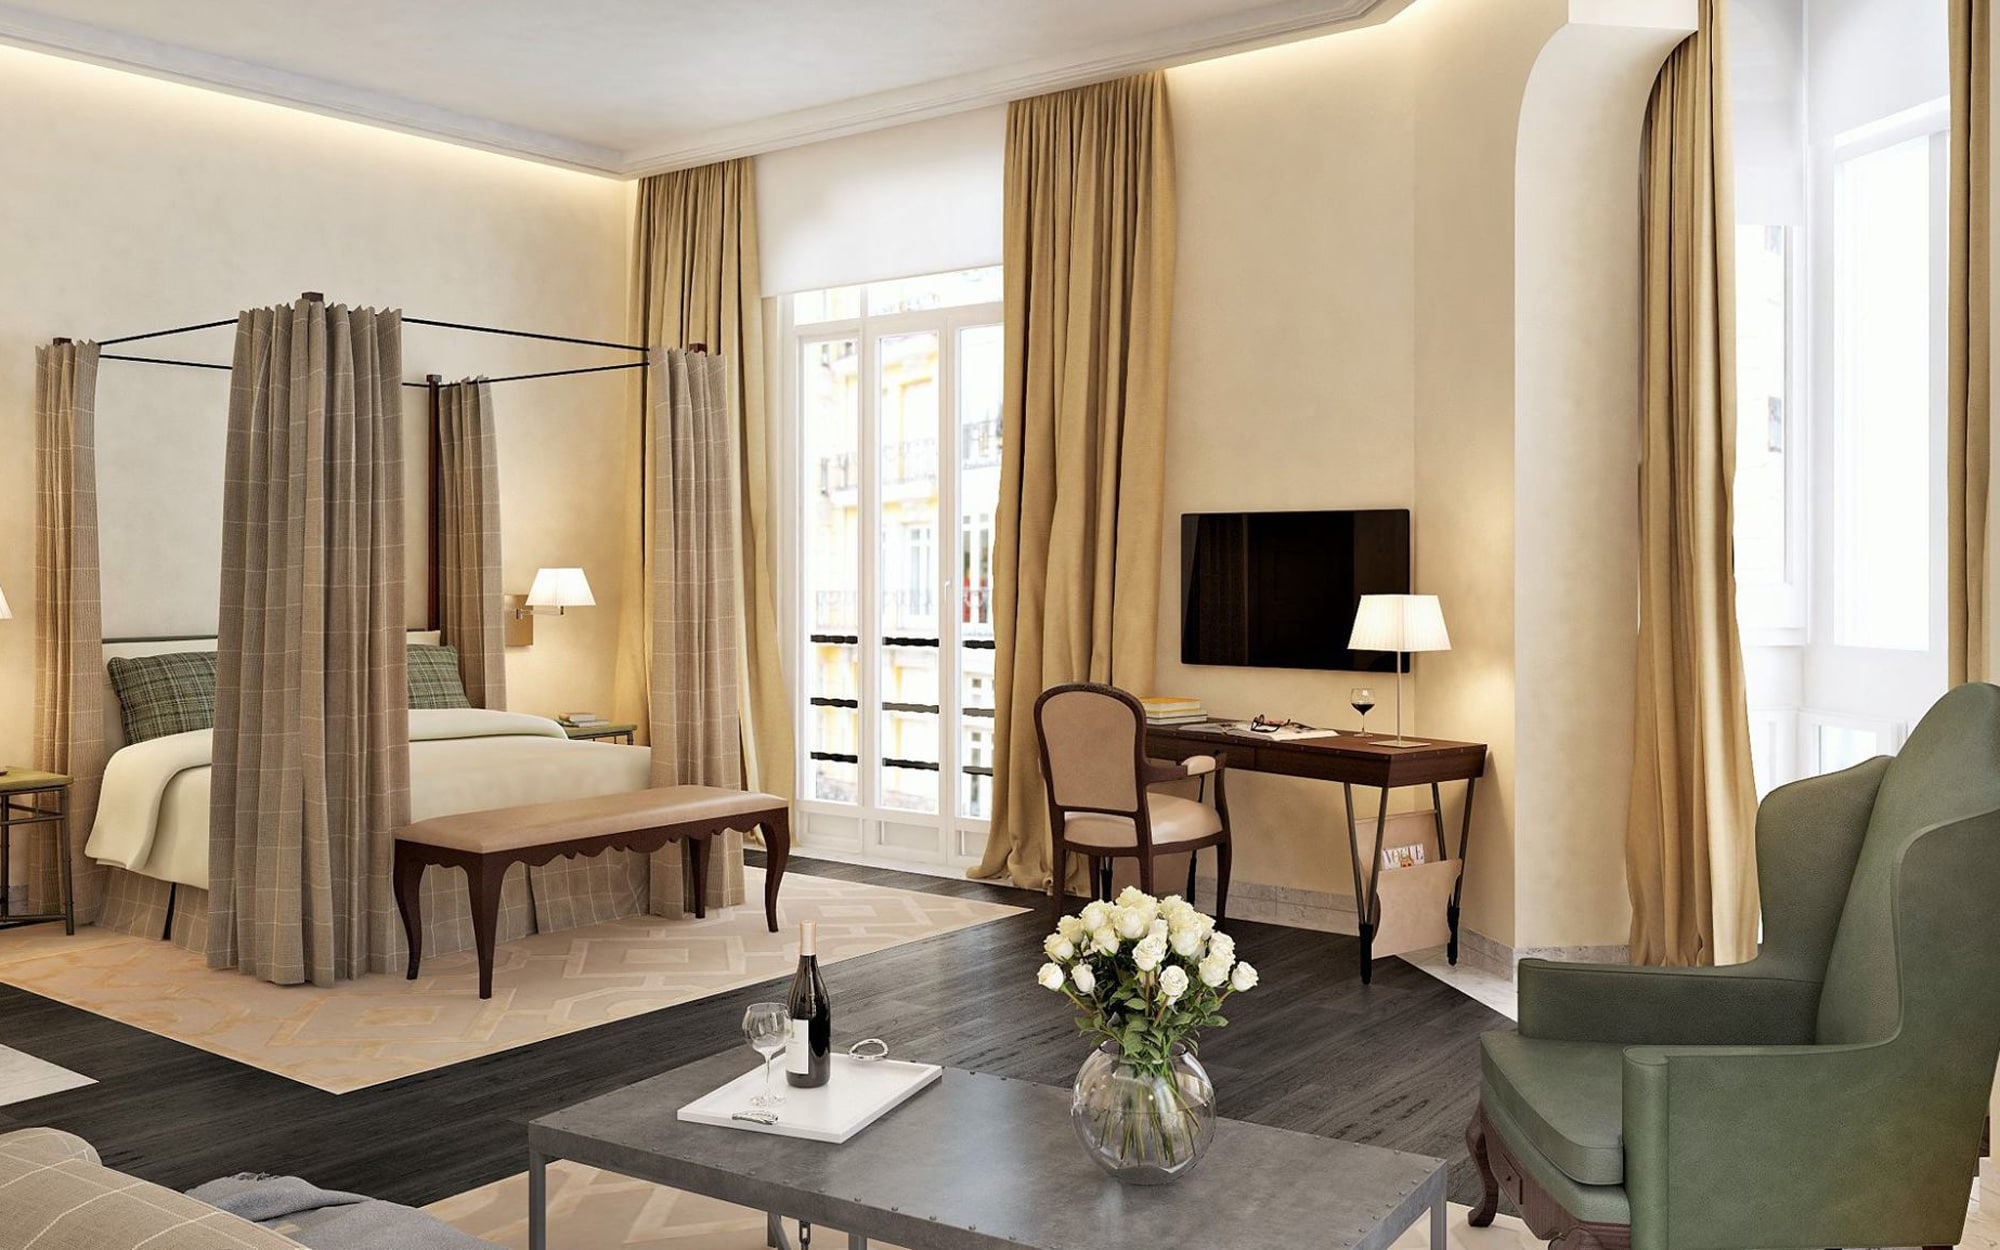 Urso Hotel Spa Review Madrid Spain Telegraph Travel